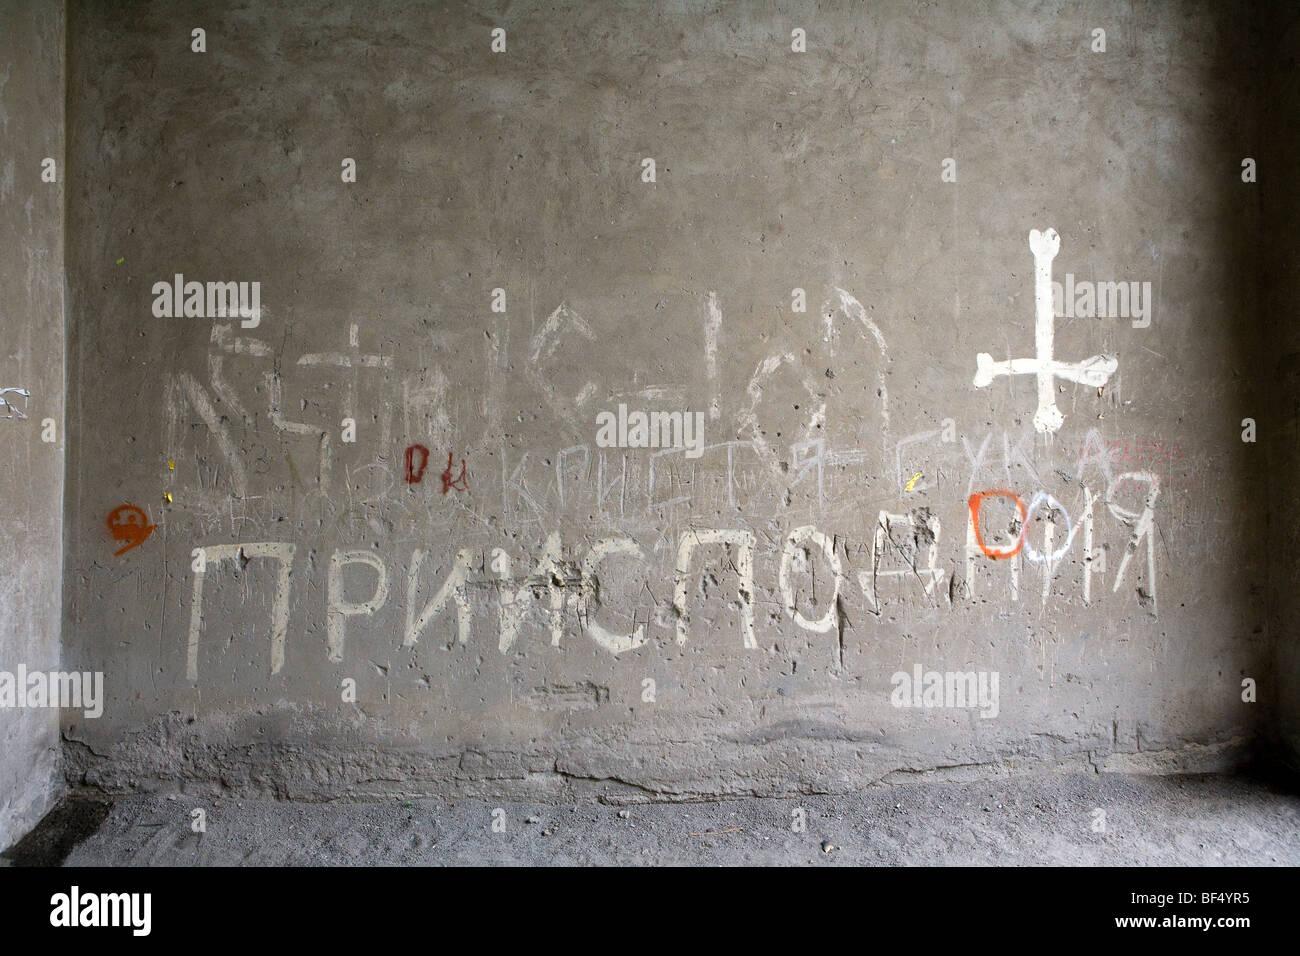 graffiti russian christian right wing - Stock Image